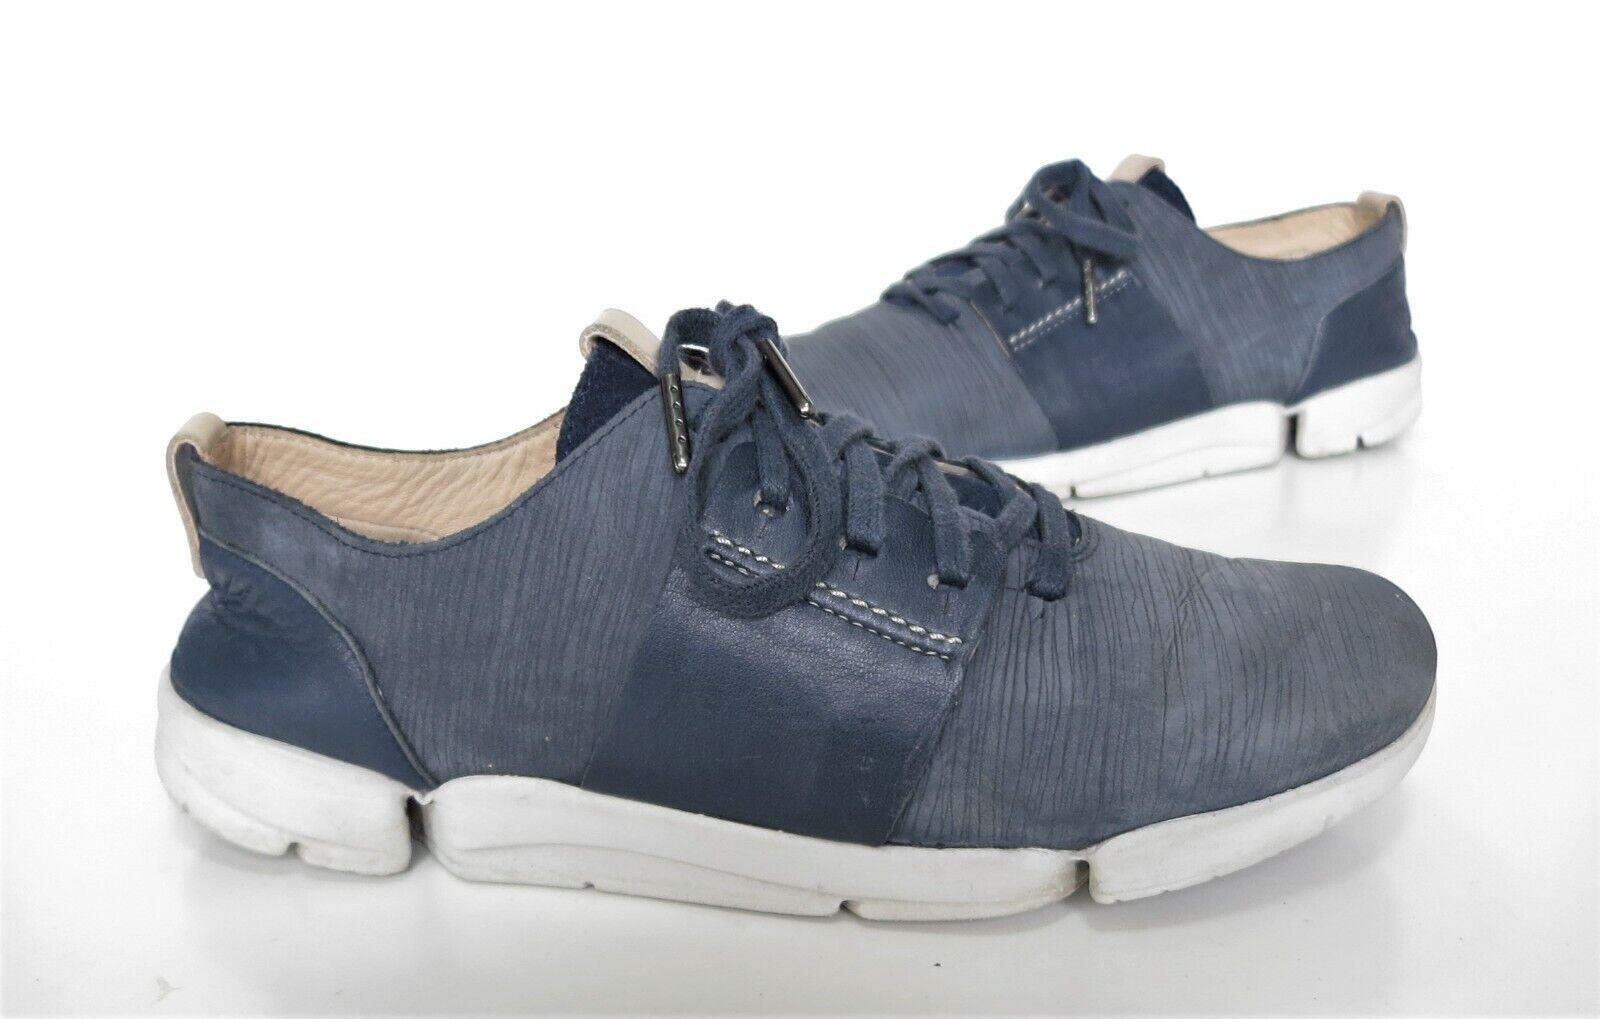 Ladies CLARKS Originals Trigenic Blue Leather Comfort Shoes Size 5 D Good Cond